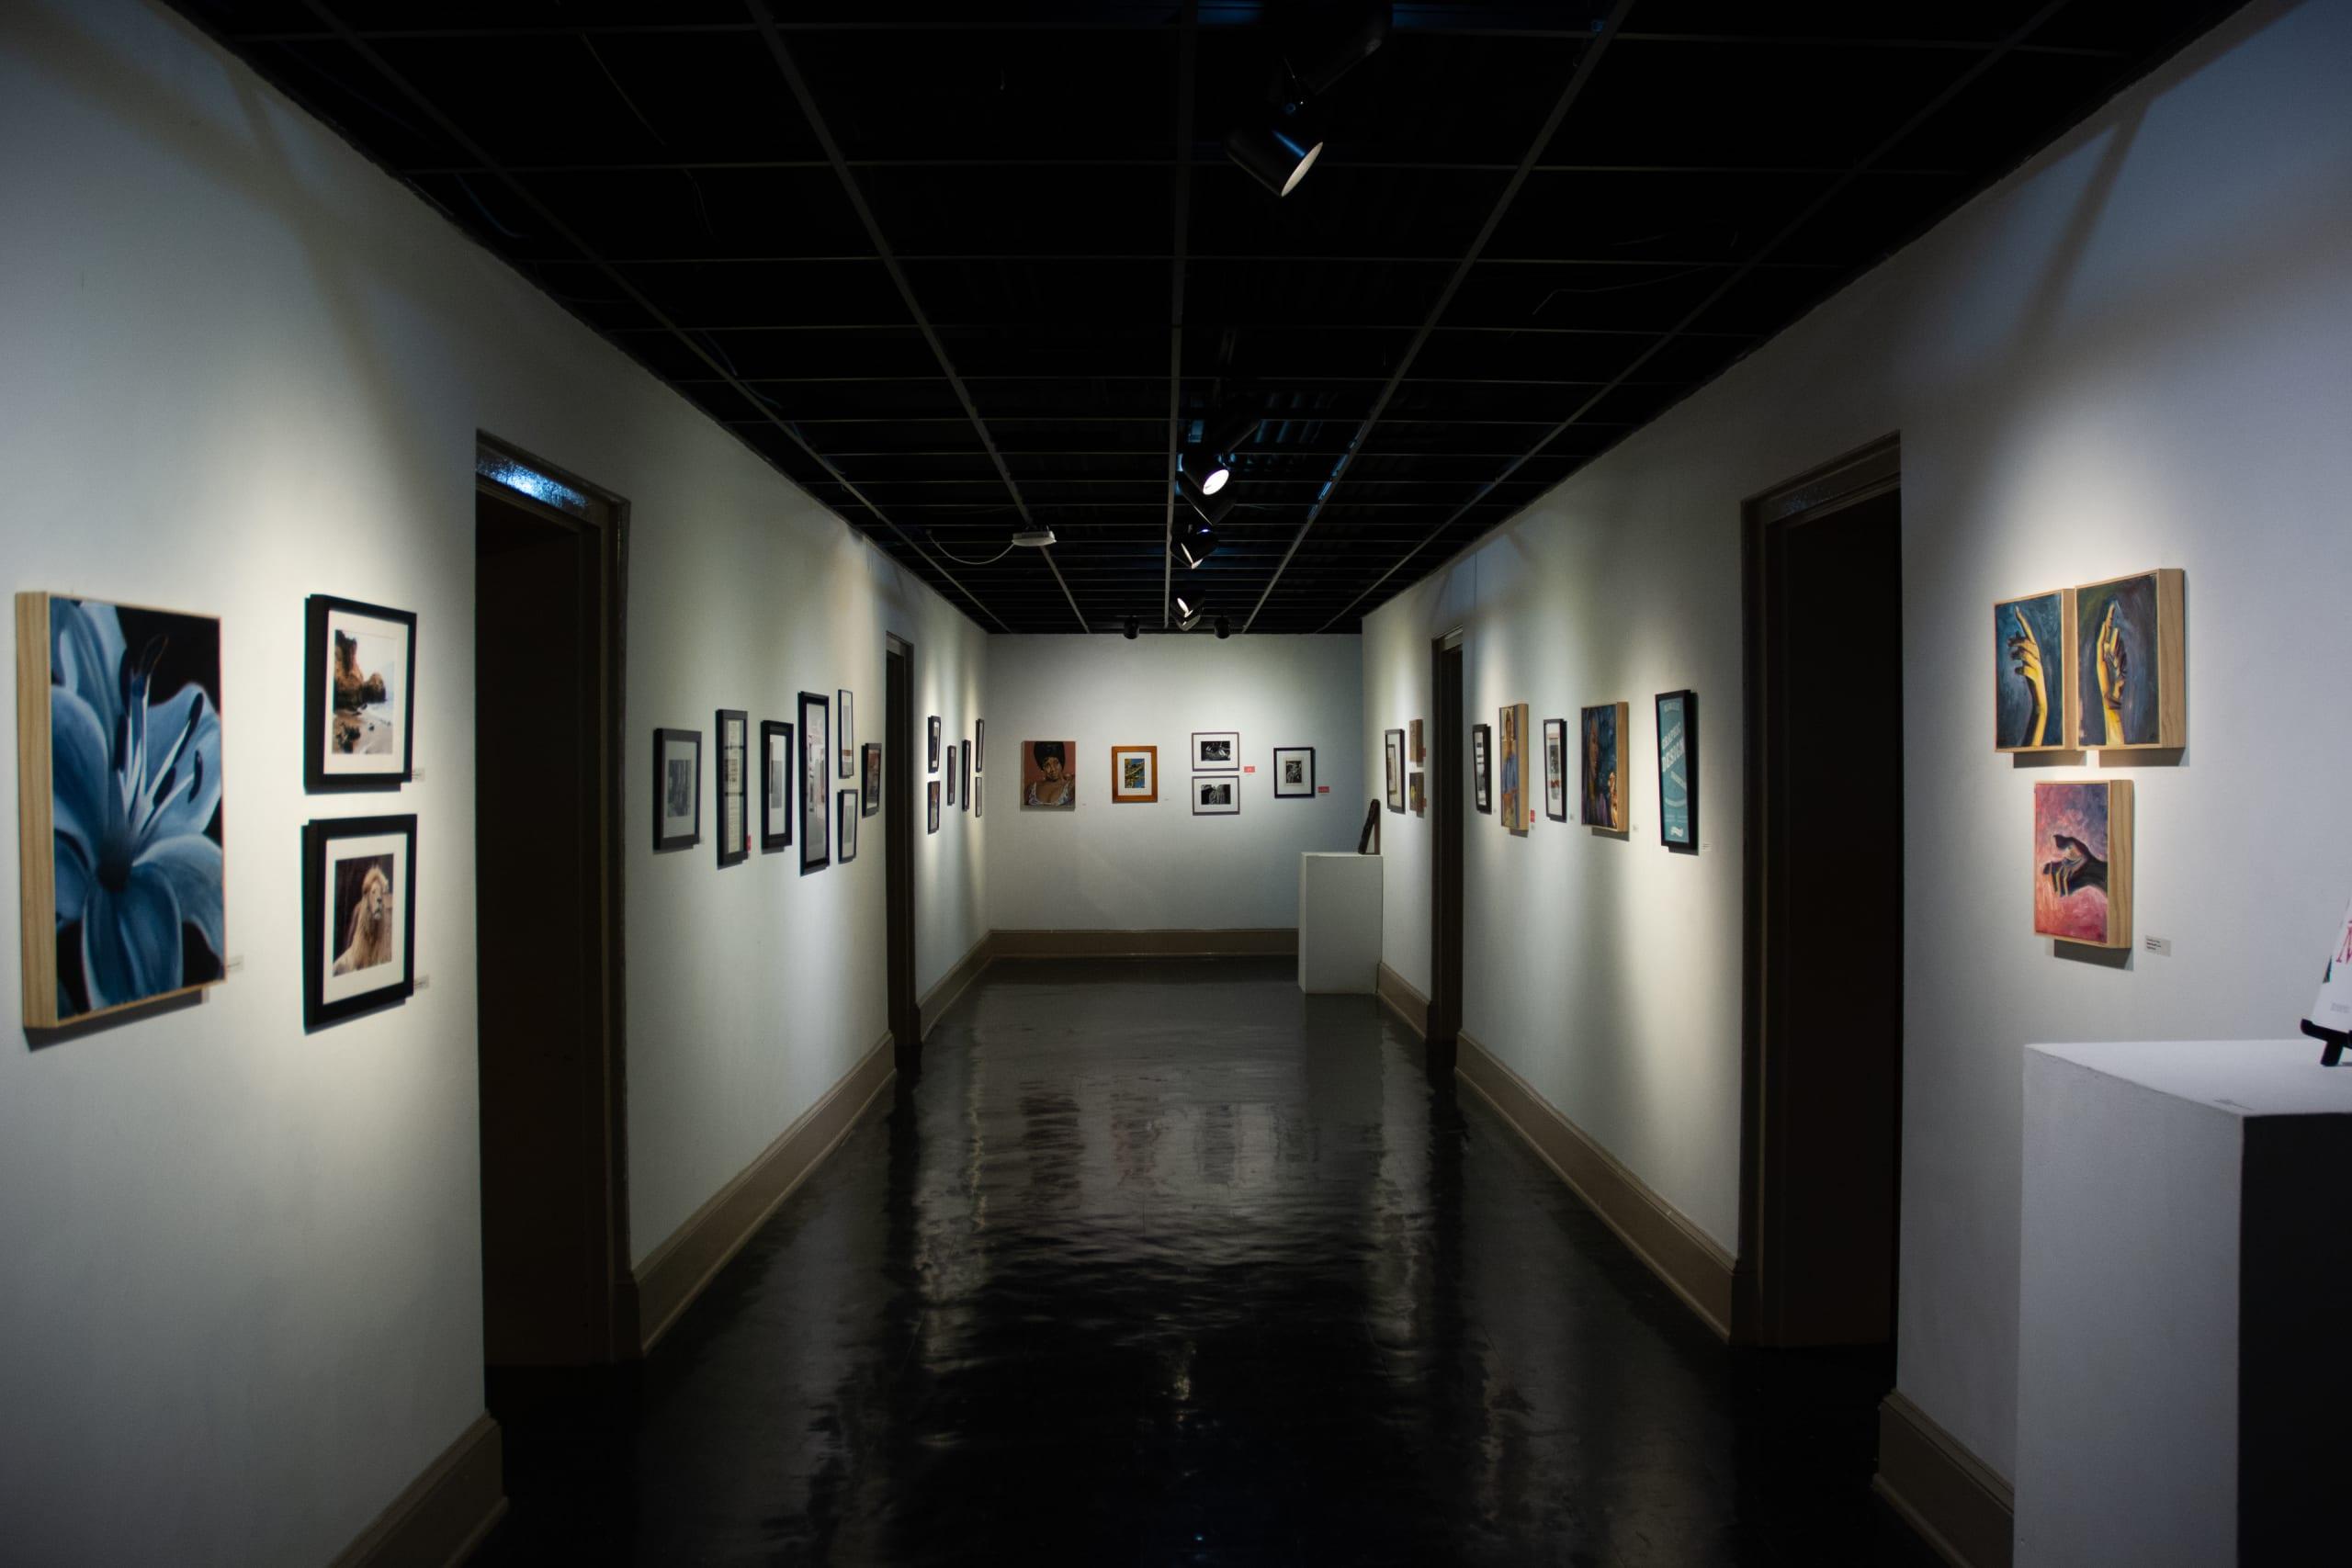 Inside the Milligan Art Gallery